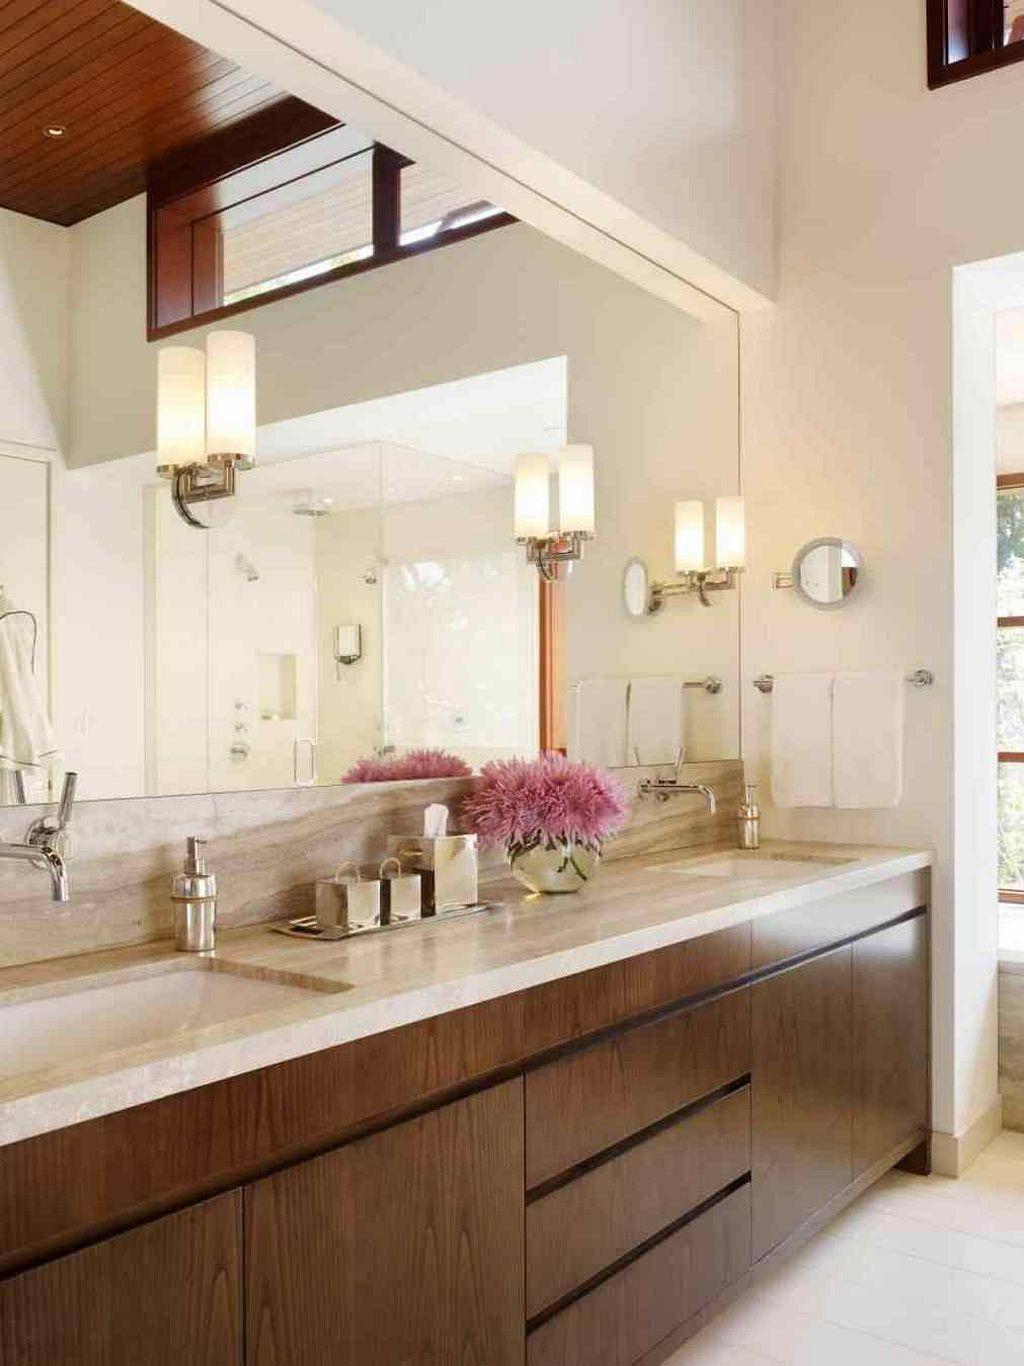 41 DIY Bathroom Counter Design Ideas   Counter design, Granite ...